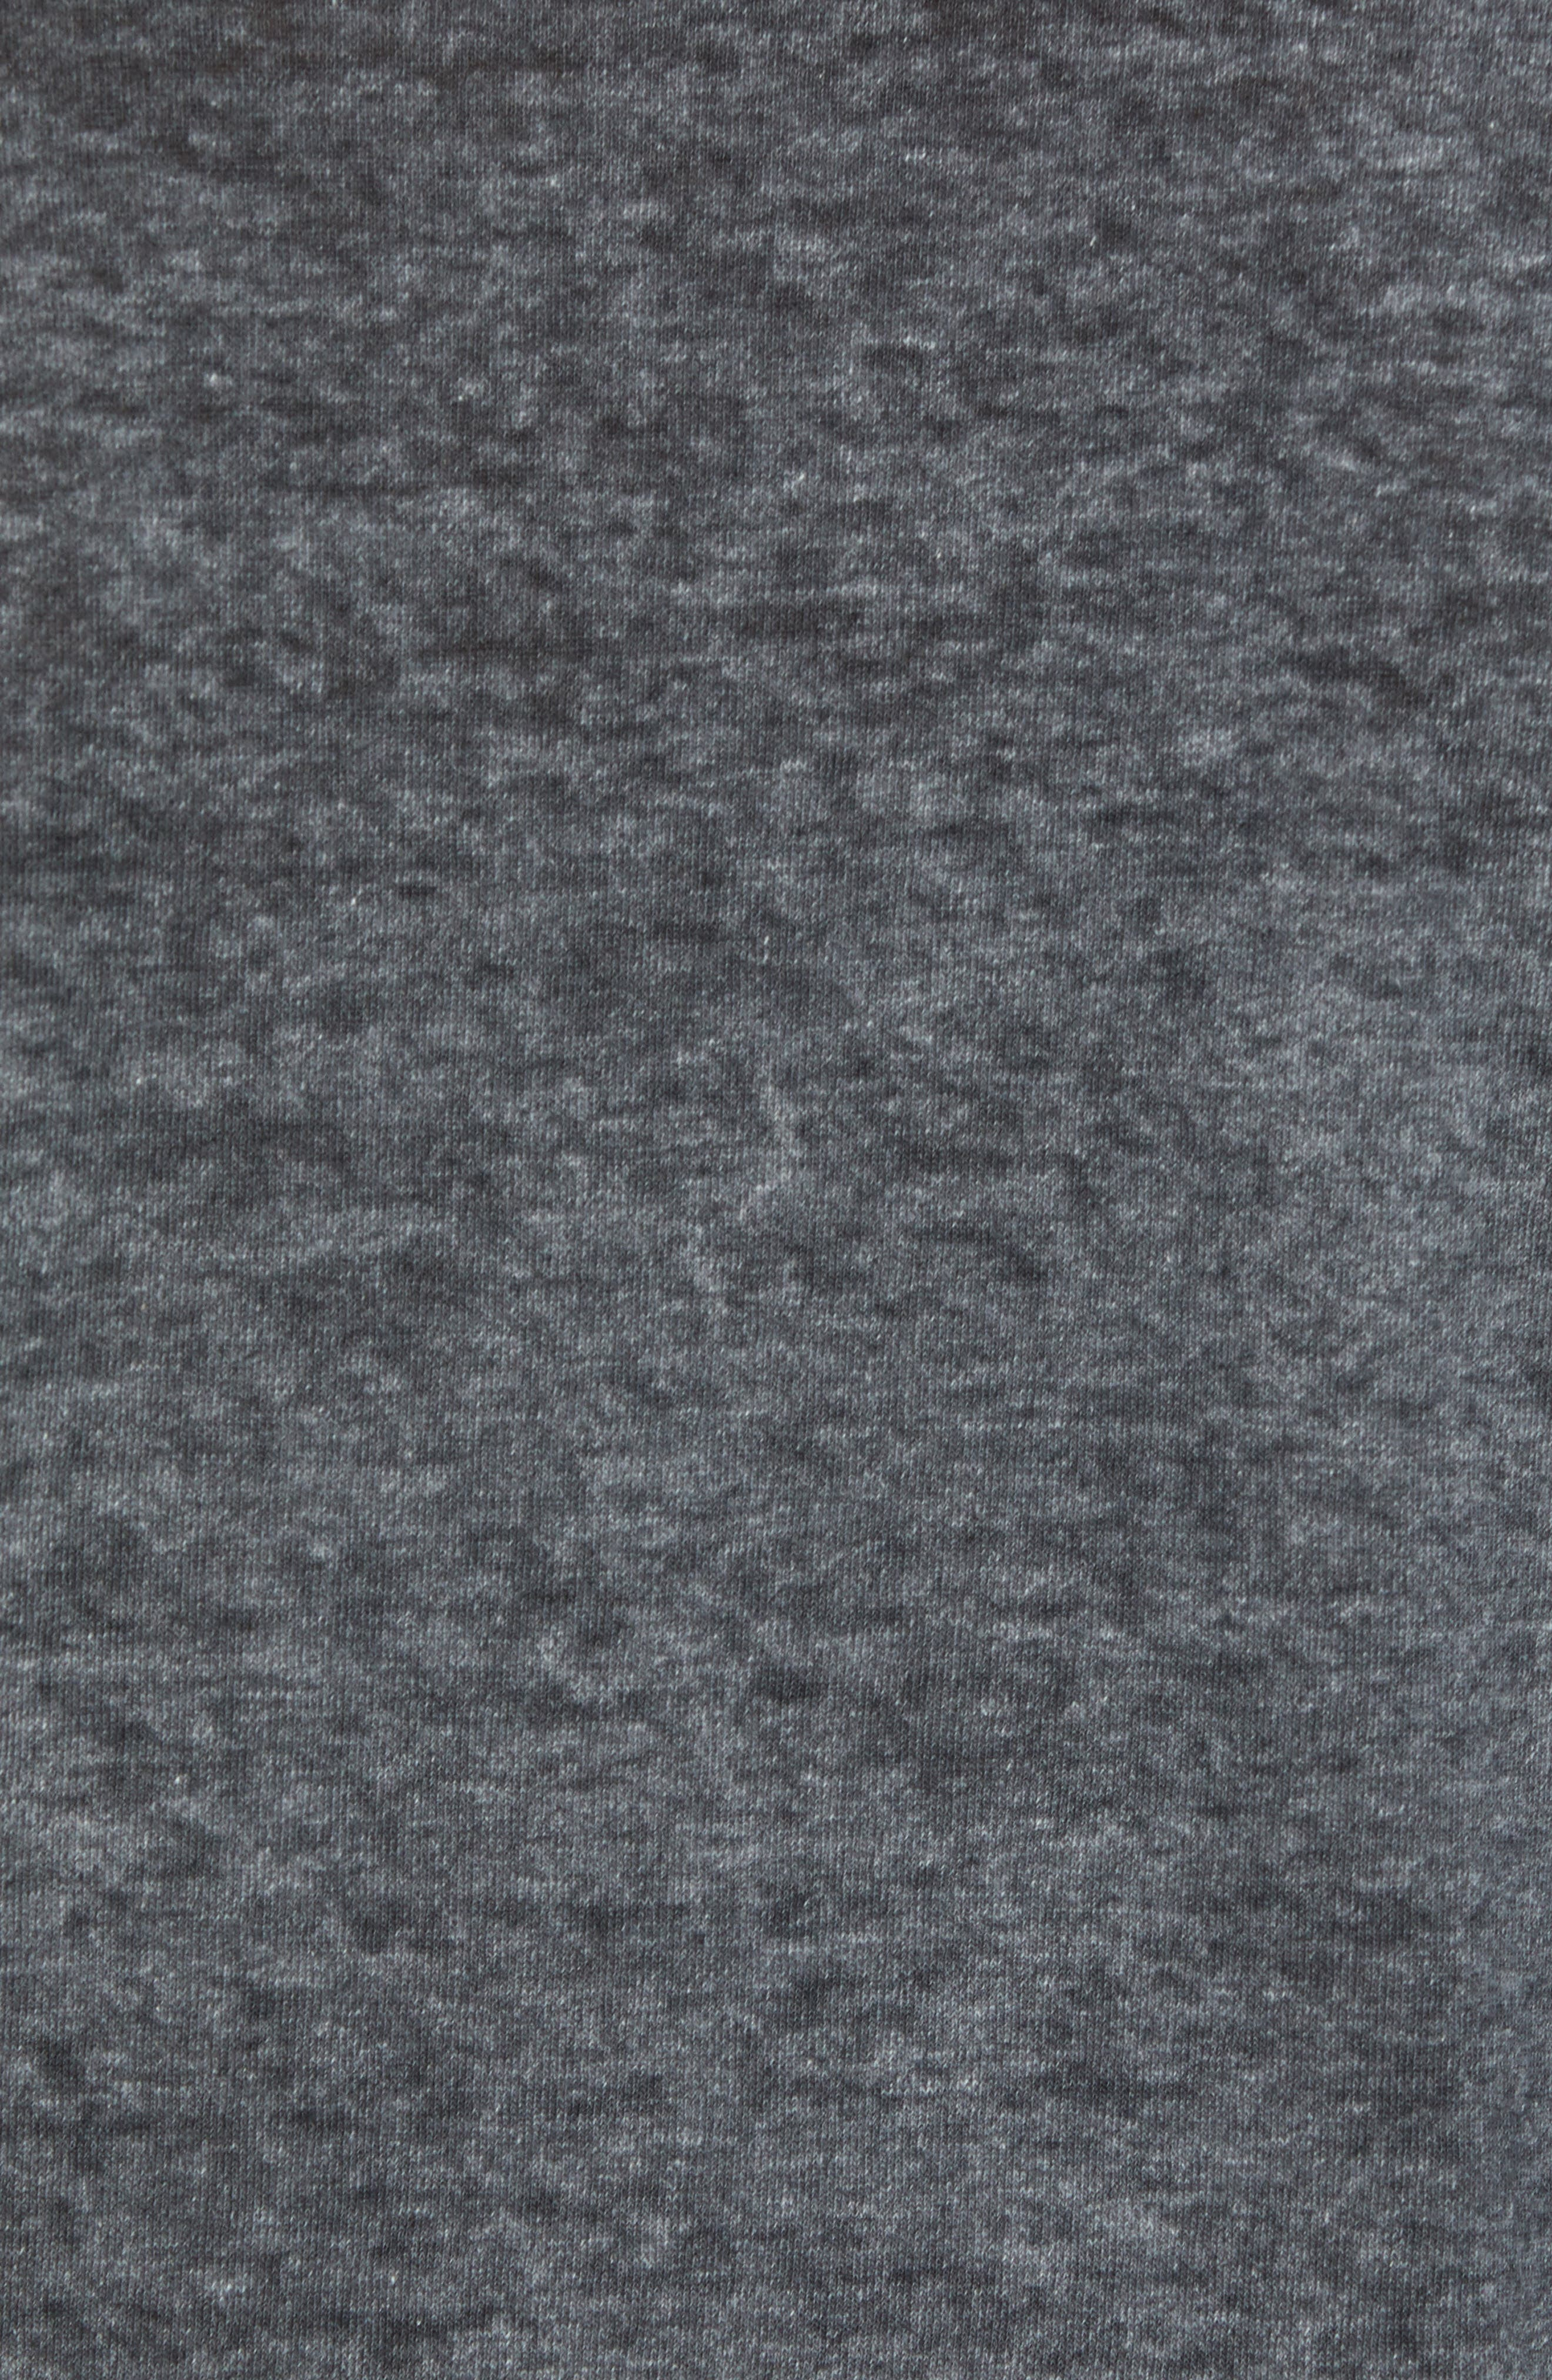 AC/DC Live at The Donington T-Shirt,                             Alternate thumbnail 5, color,                             Grey Acdc Burnout